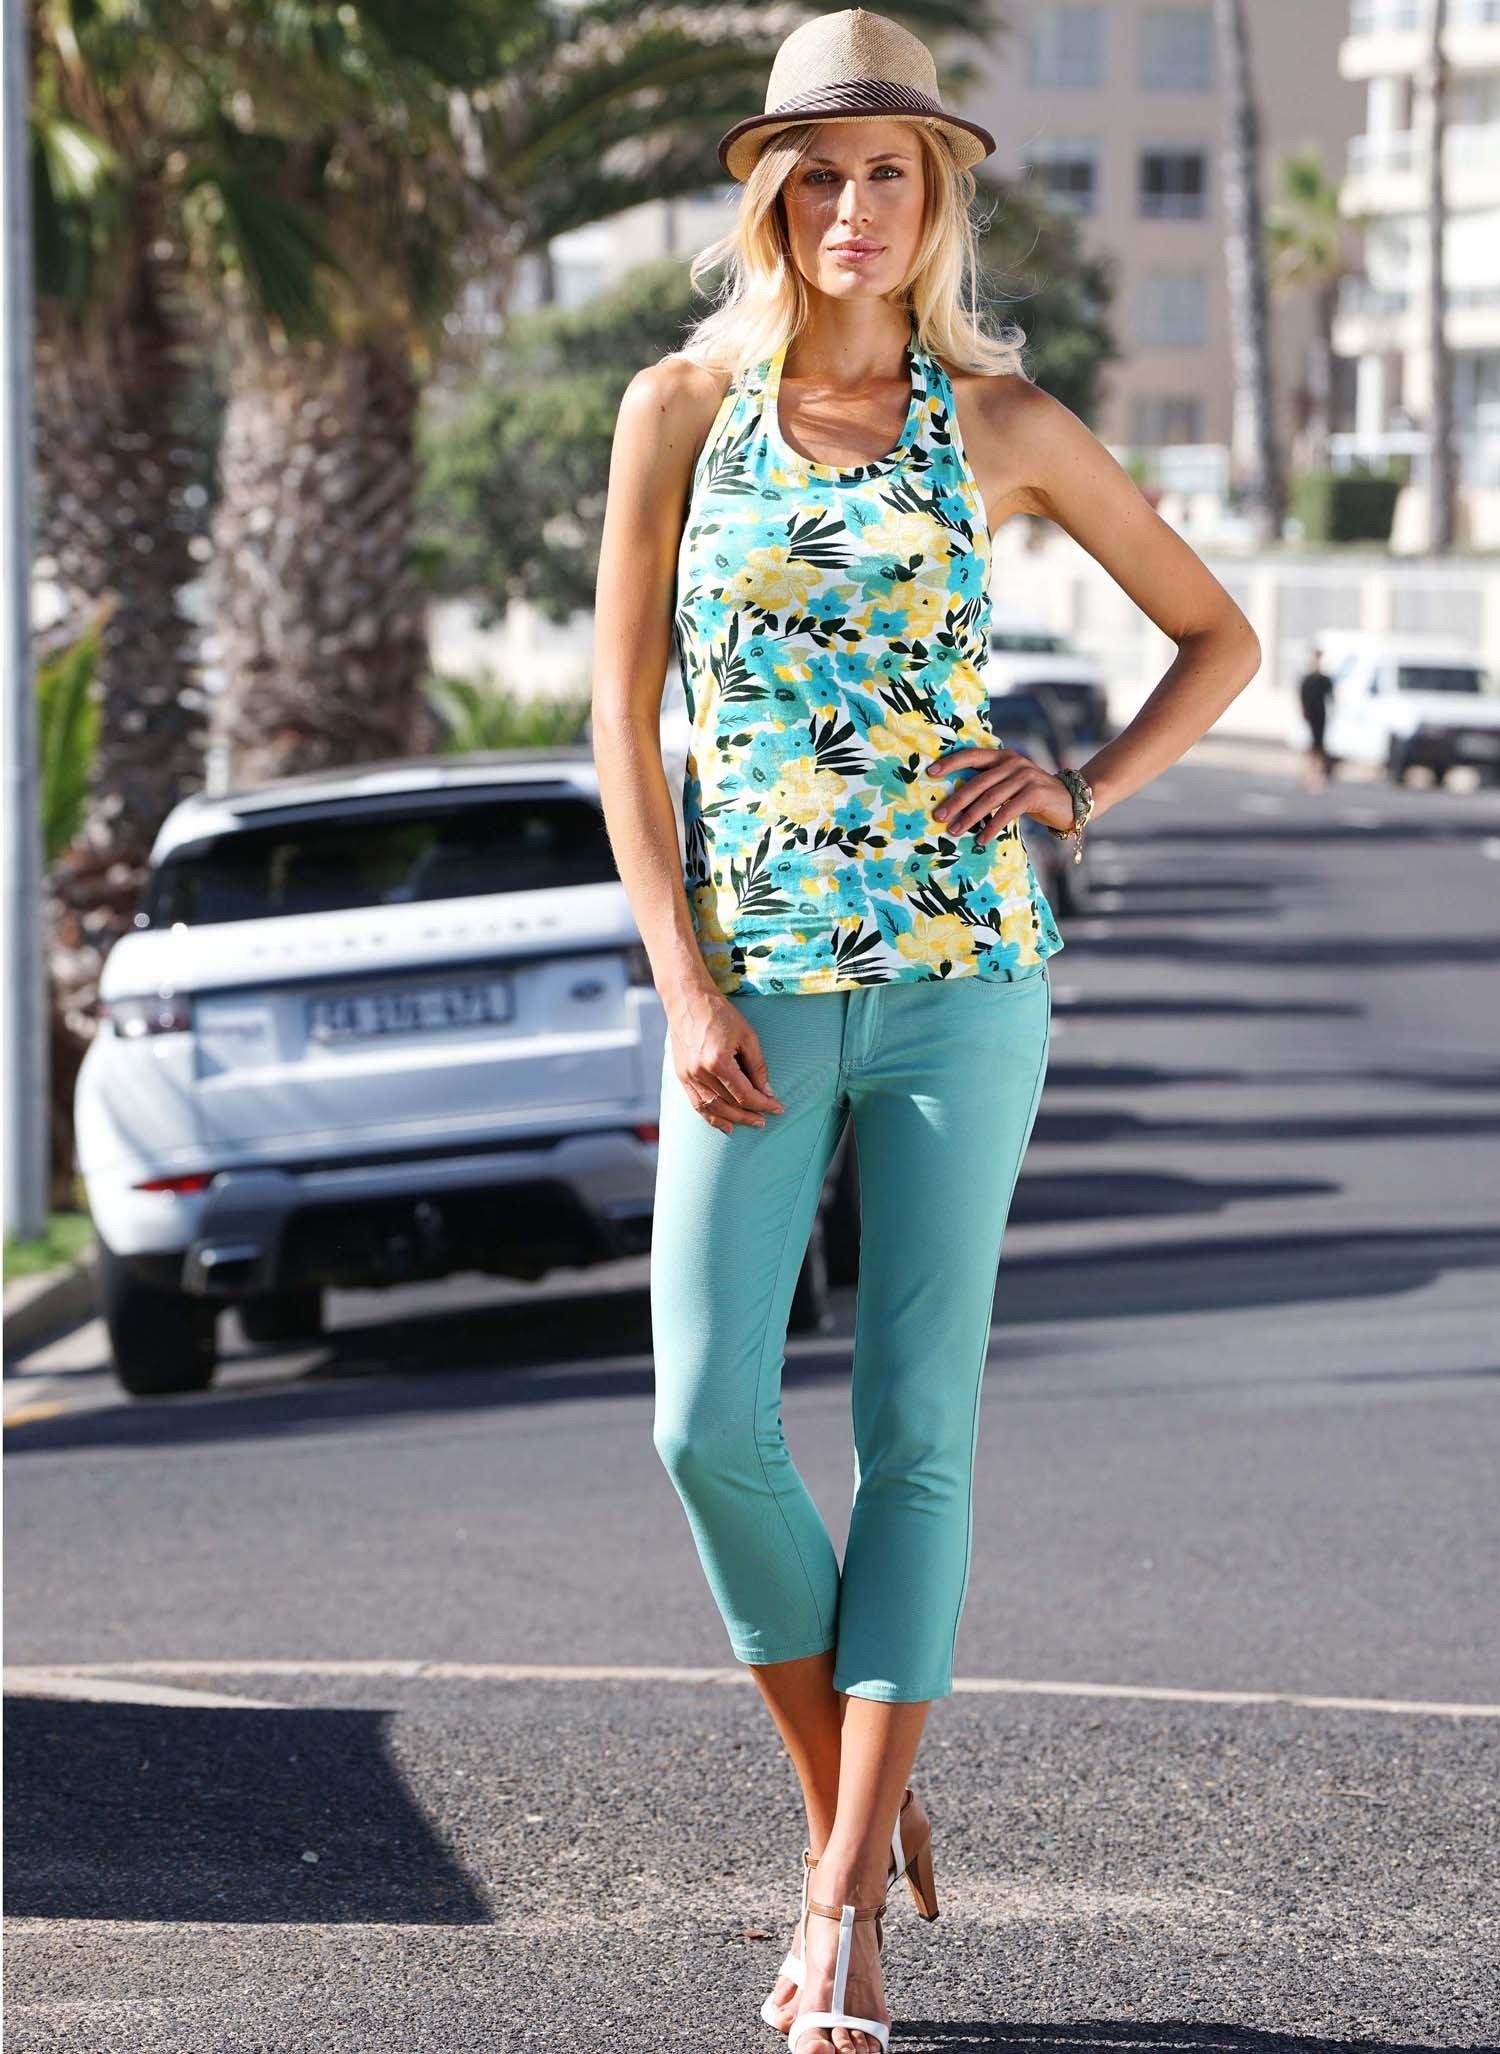 D-Capri-Colors-Jeans türkis L 069 - 1 - Ronja.ch